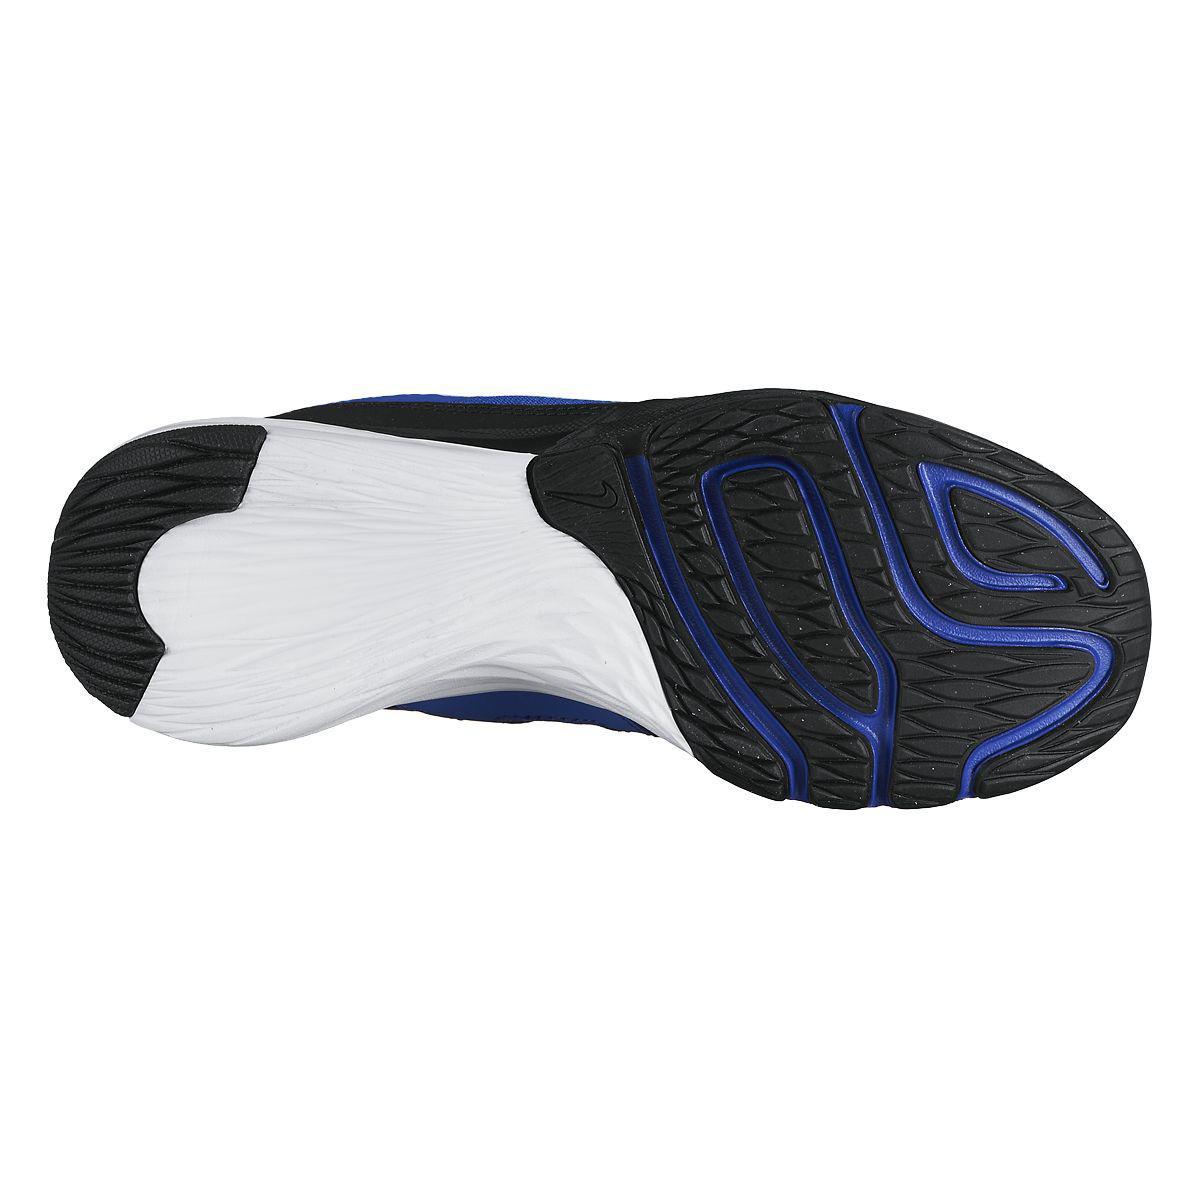 b958c1289c97 Nike Boys Tri-Fusion Run Running Shoes - Game Royal Black ...